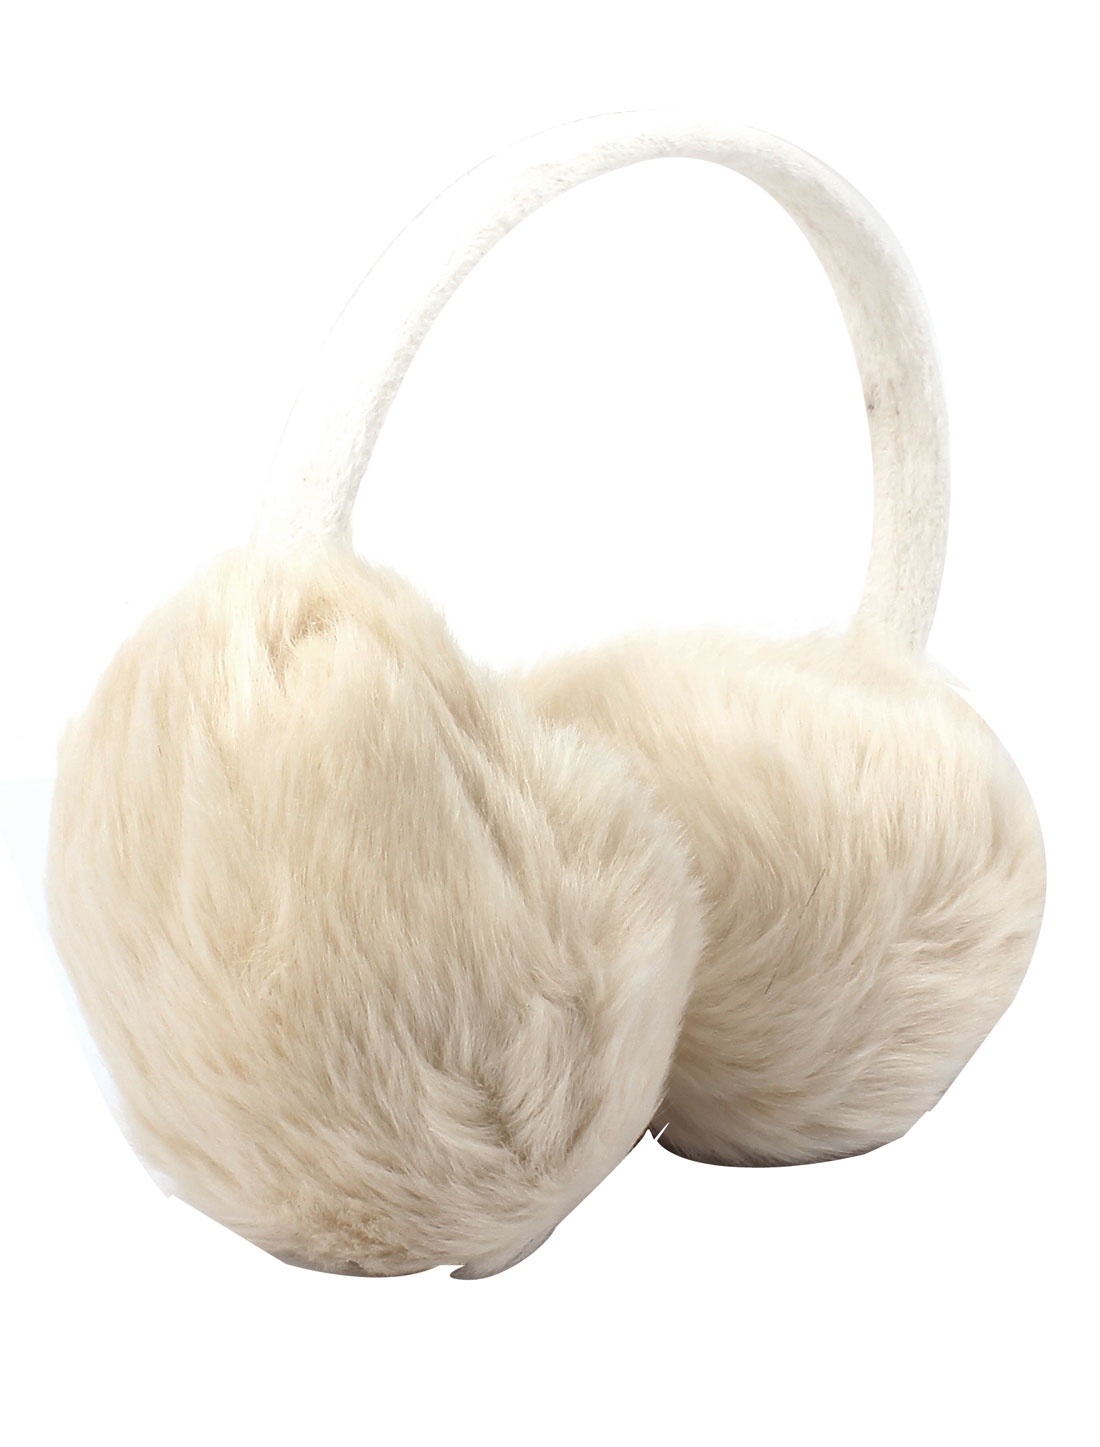 Girls Lady Winter Soft Plush Earmuffs Ear Warmers Earlap Headband Off White